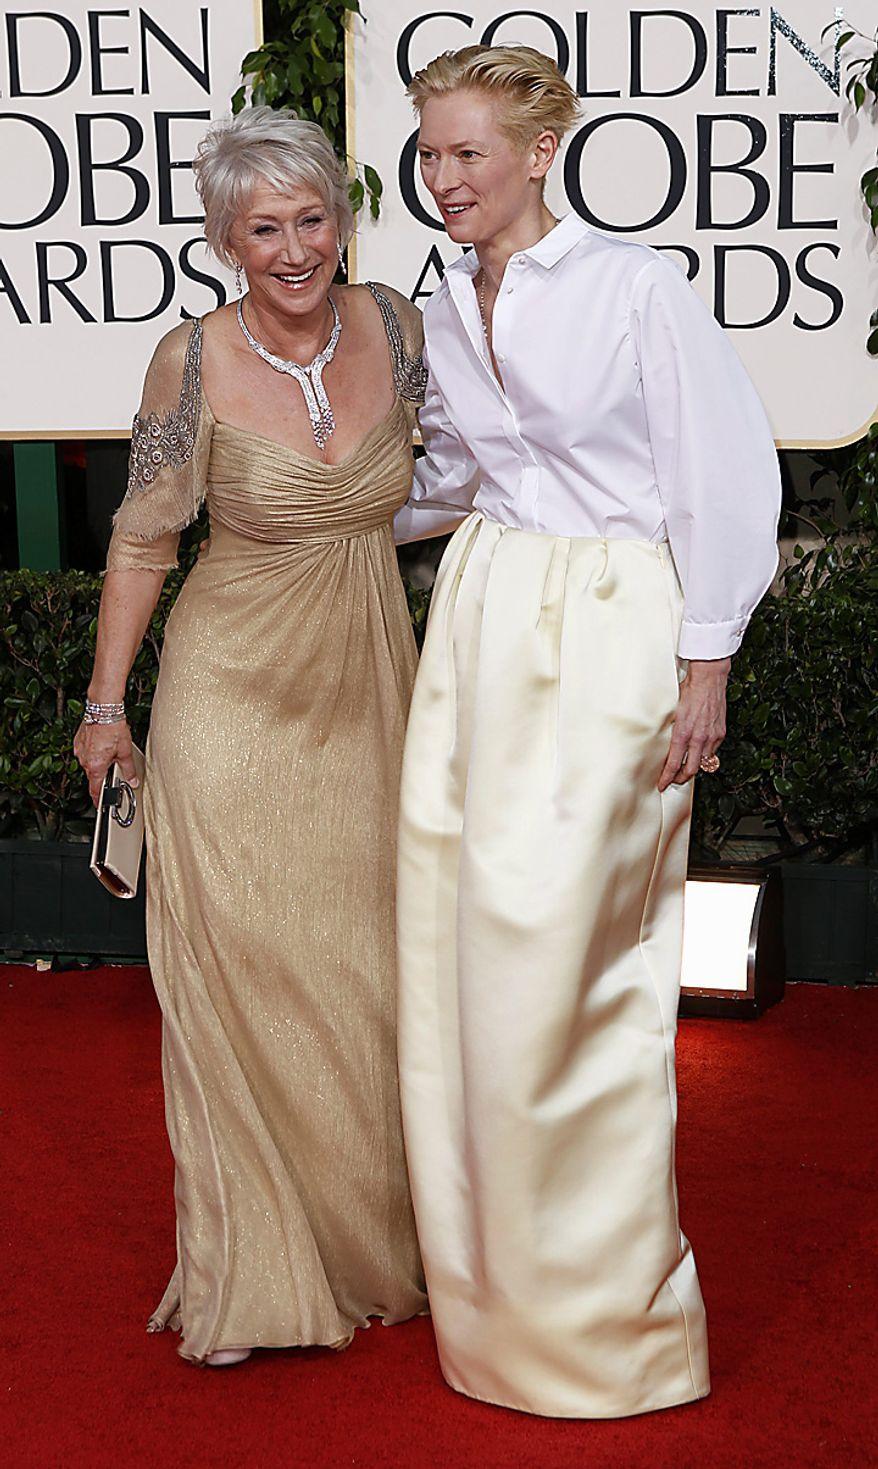 Tilda Swinton, right, and Helen Mirren arrive for the Golden Globe Awards Sunday, Jan. 16, 2011, in Beverly Hills, Calif. (AP Photo/Matt Sayles)